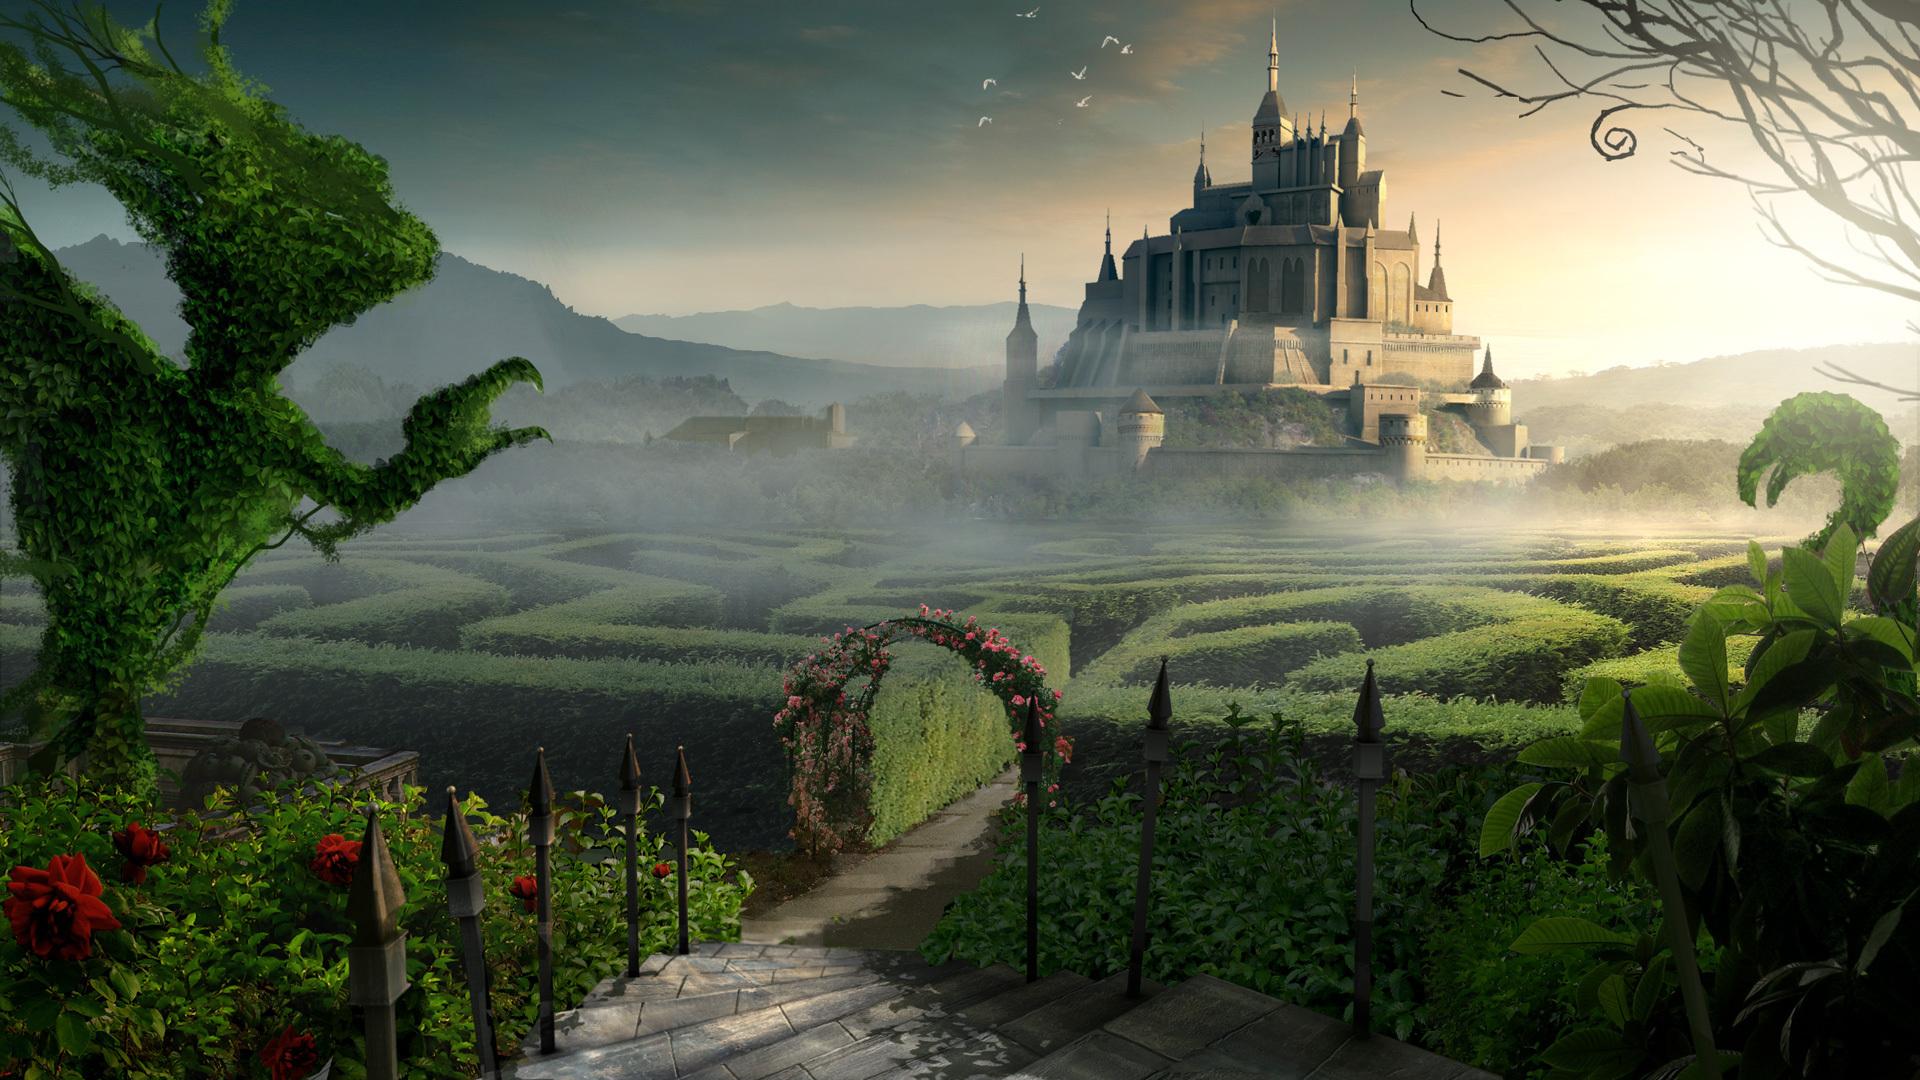 Alien landscape wallpaper wallpapersafari for Paesaggi fantasy immagini